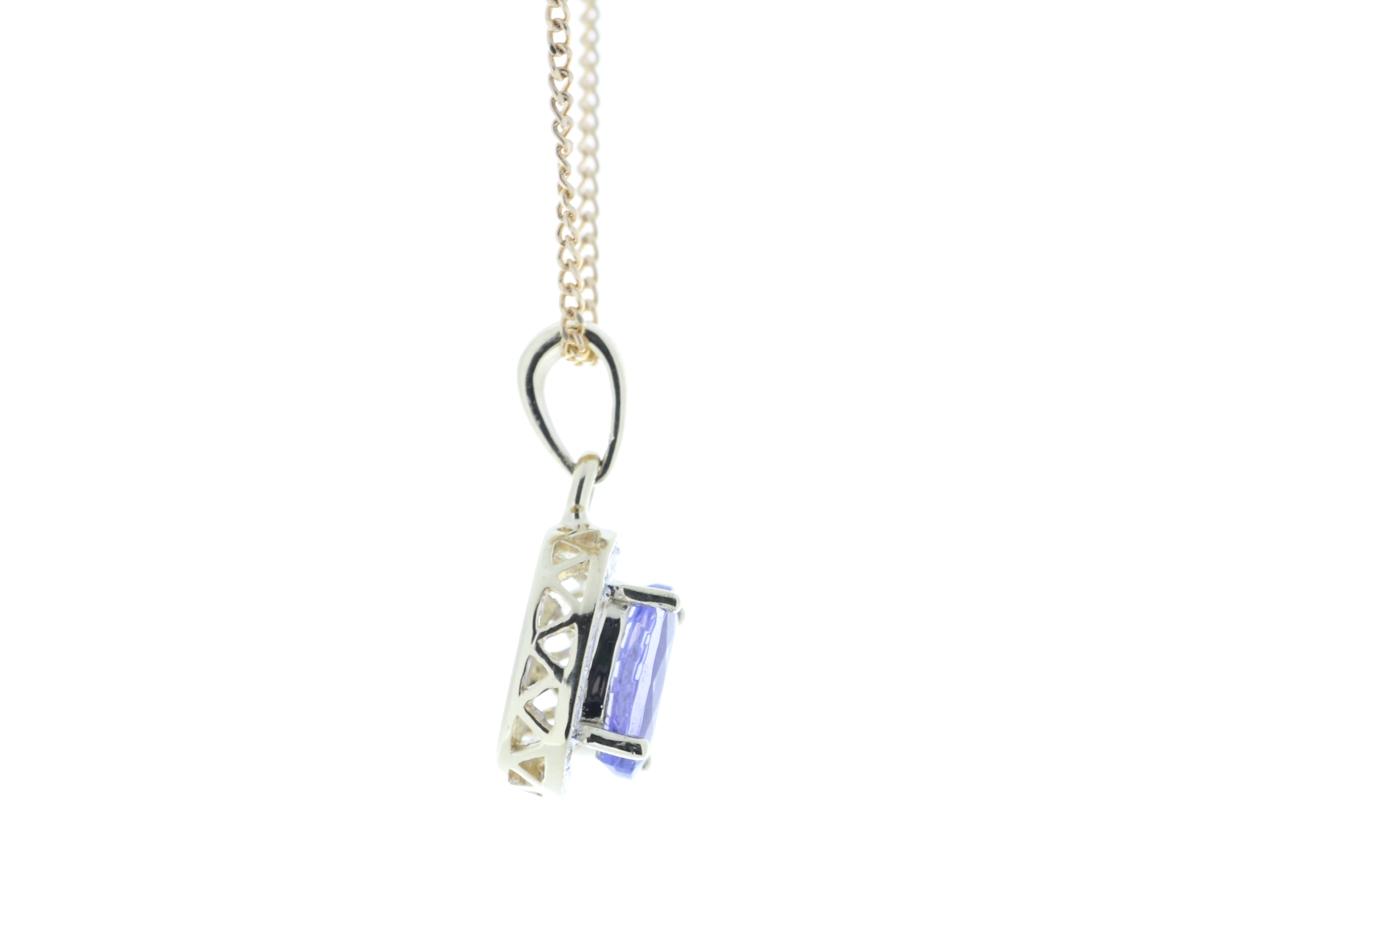 9ct Yellow Gold Diamond And Tanzanite Pendant - Image 2 of 5